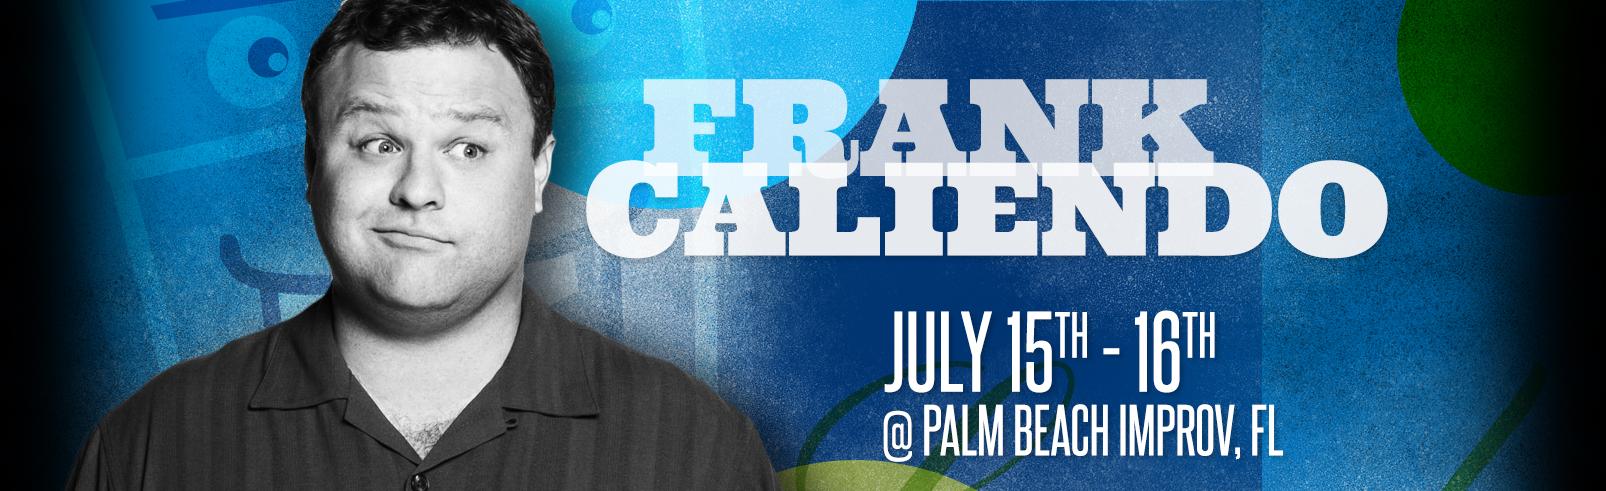 Frank Caliendo @ Palm Beach Improv